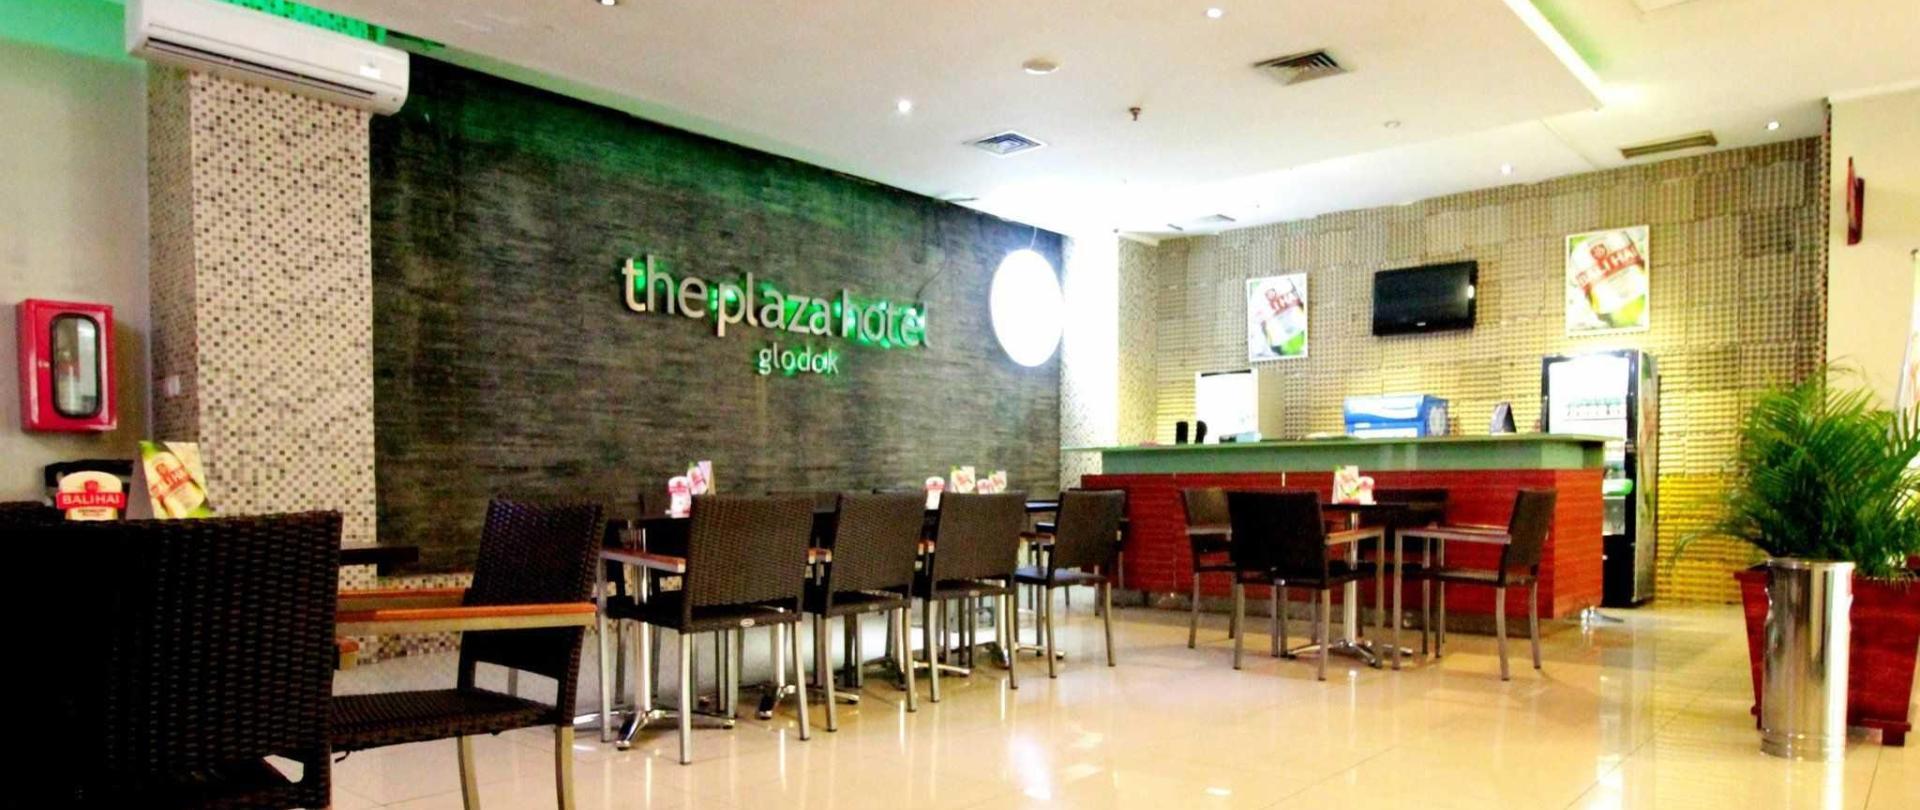 plaza-hotel-glodok-lounge.jpg